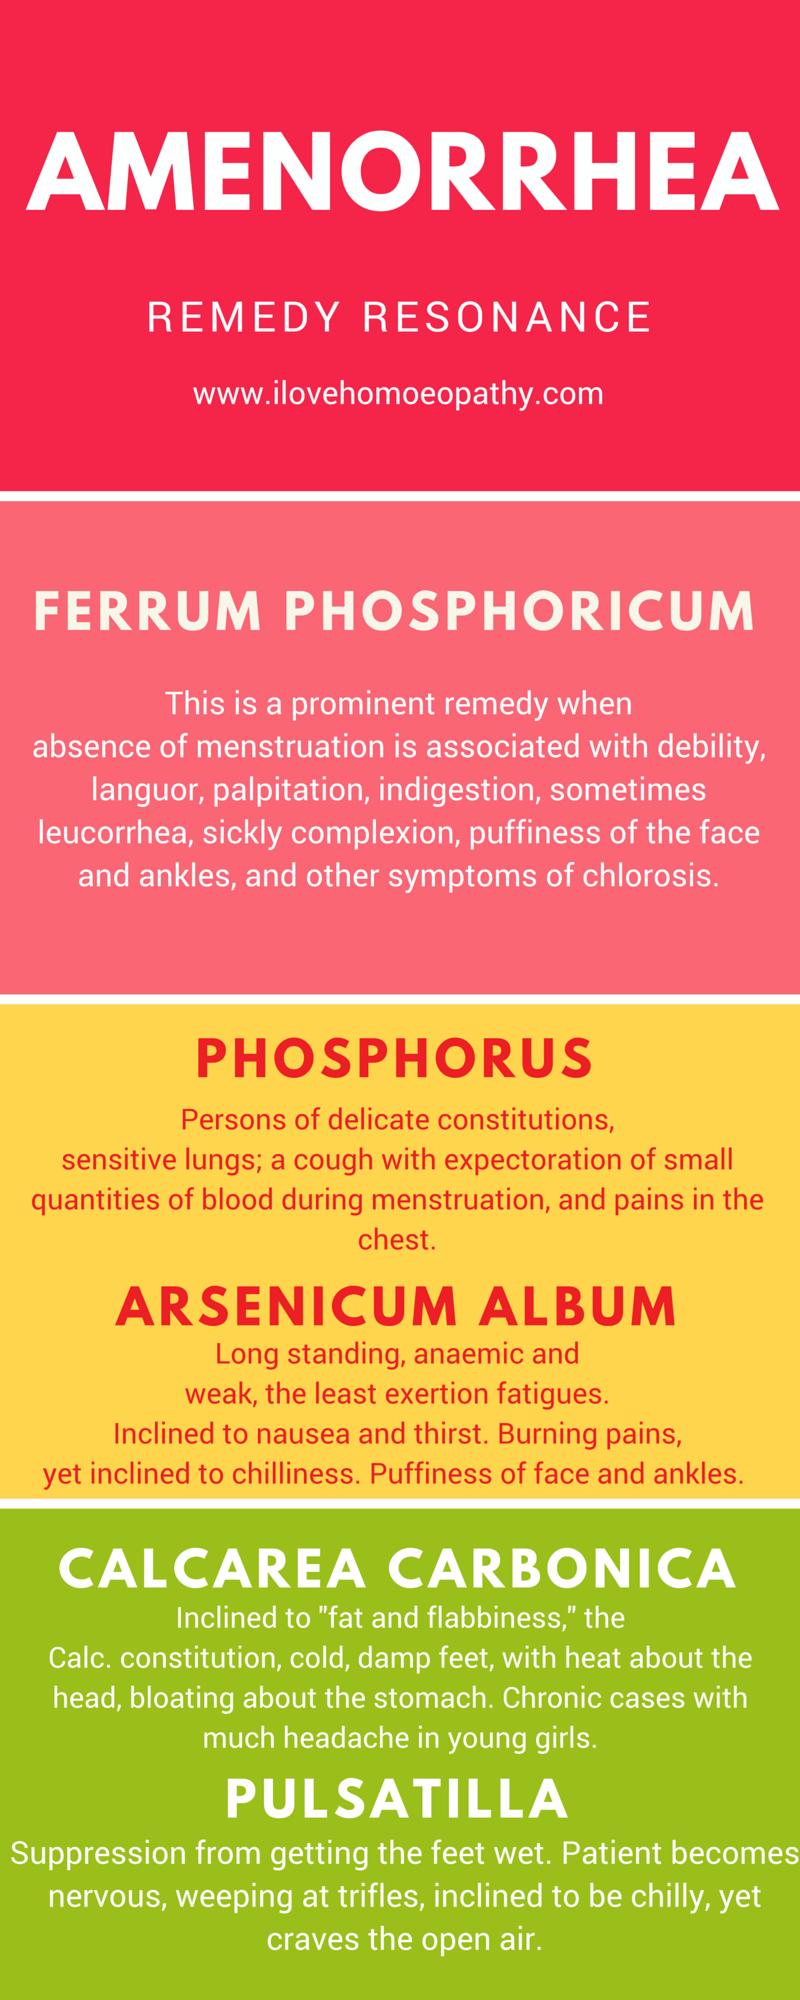 AMENORRHEA   Homöopathie   Homeopathy, Homeopathy treatment